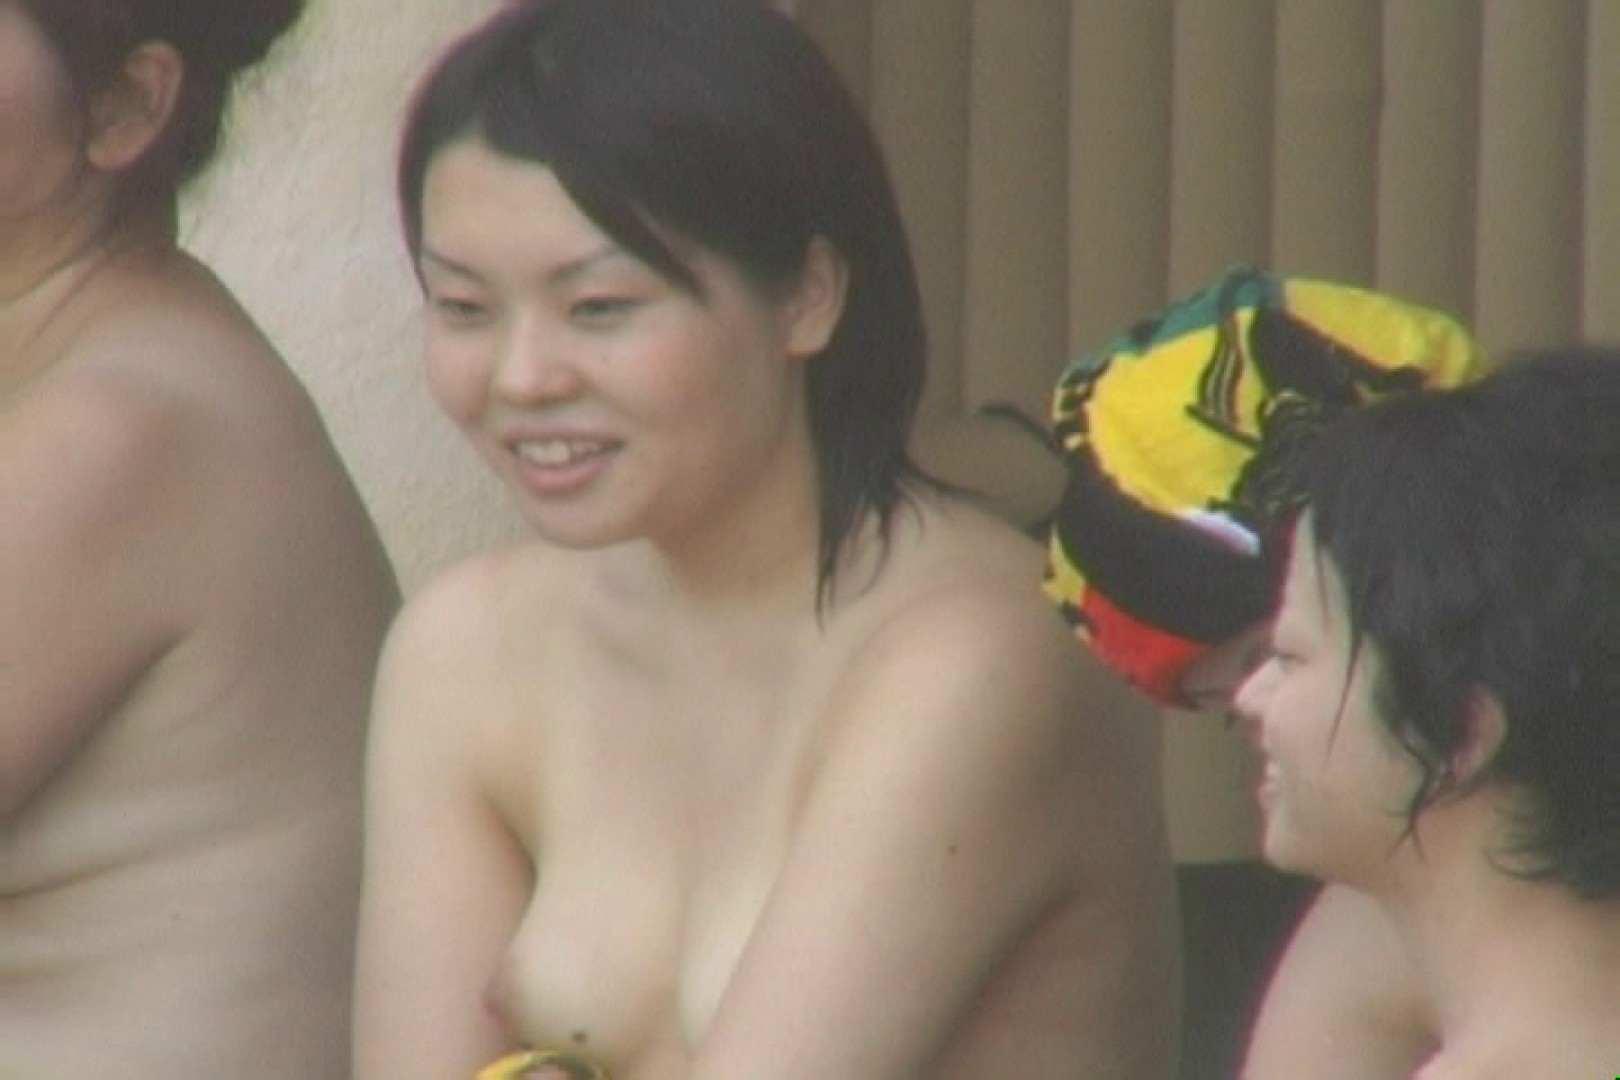 Aquaな露天風呂Vol.61【VIP限定】 OLセックス   盗撮  72画像 28